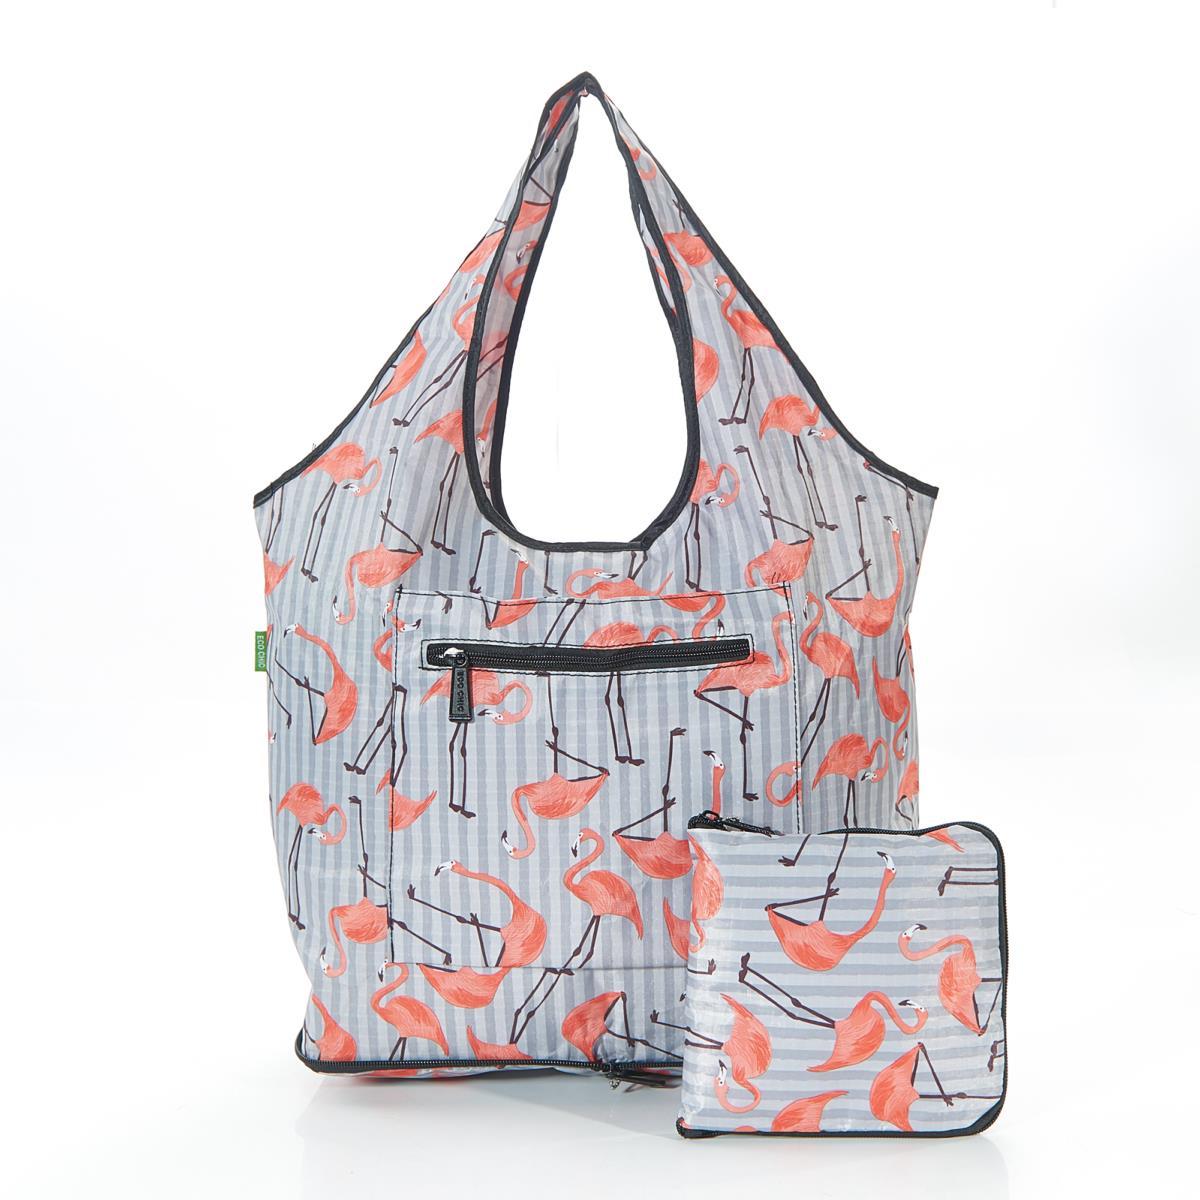 Eco Chic Foldaway Weekend Bag   Holdalls   Tote Bags   Holdalls   Tote Bags    Jarrolds Norwich, Norfolk 27e45dd698